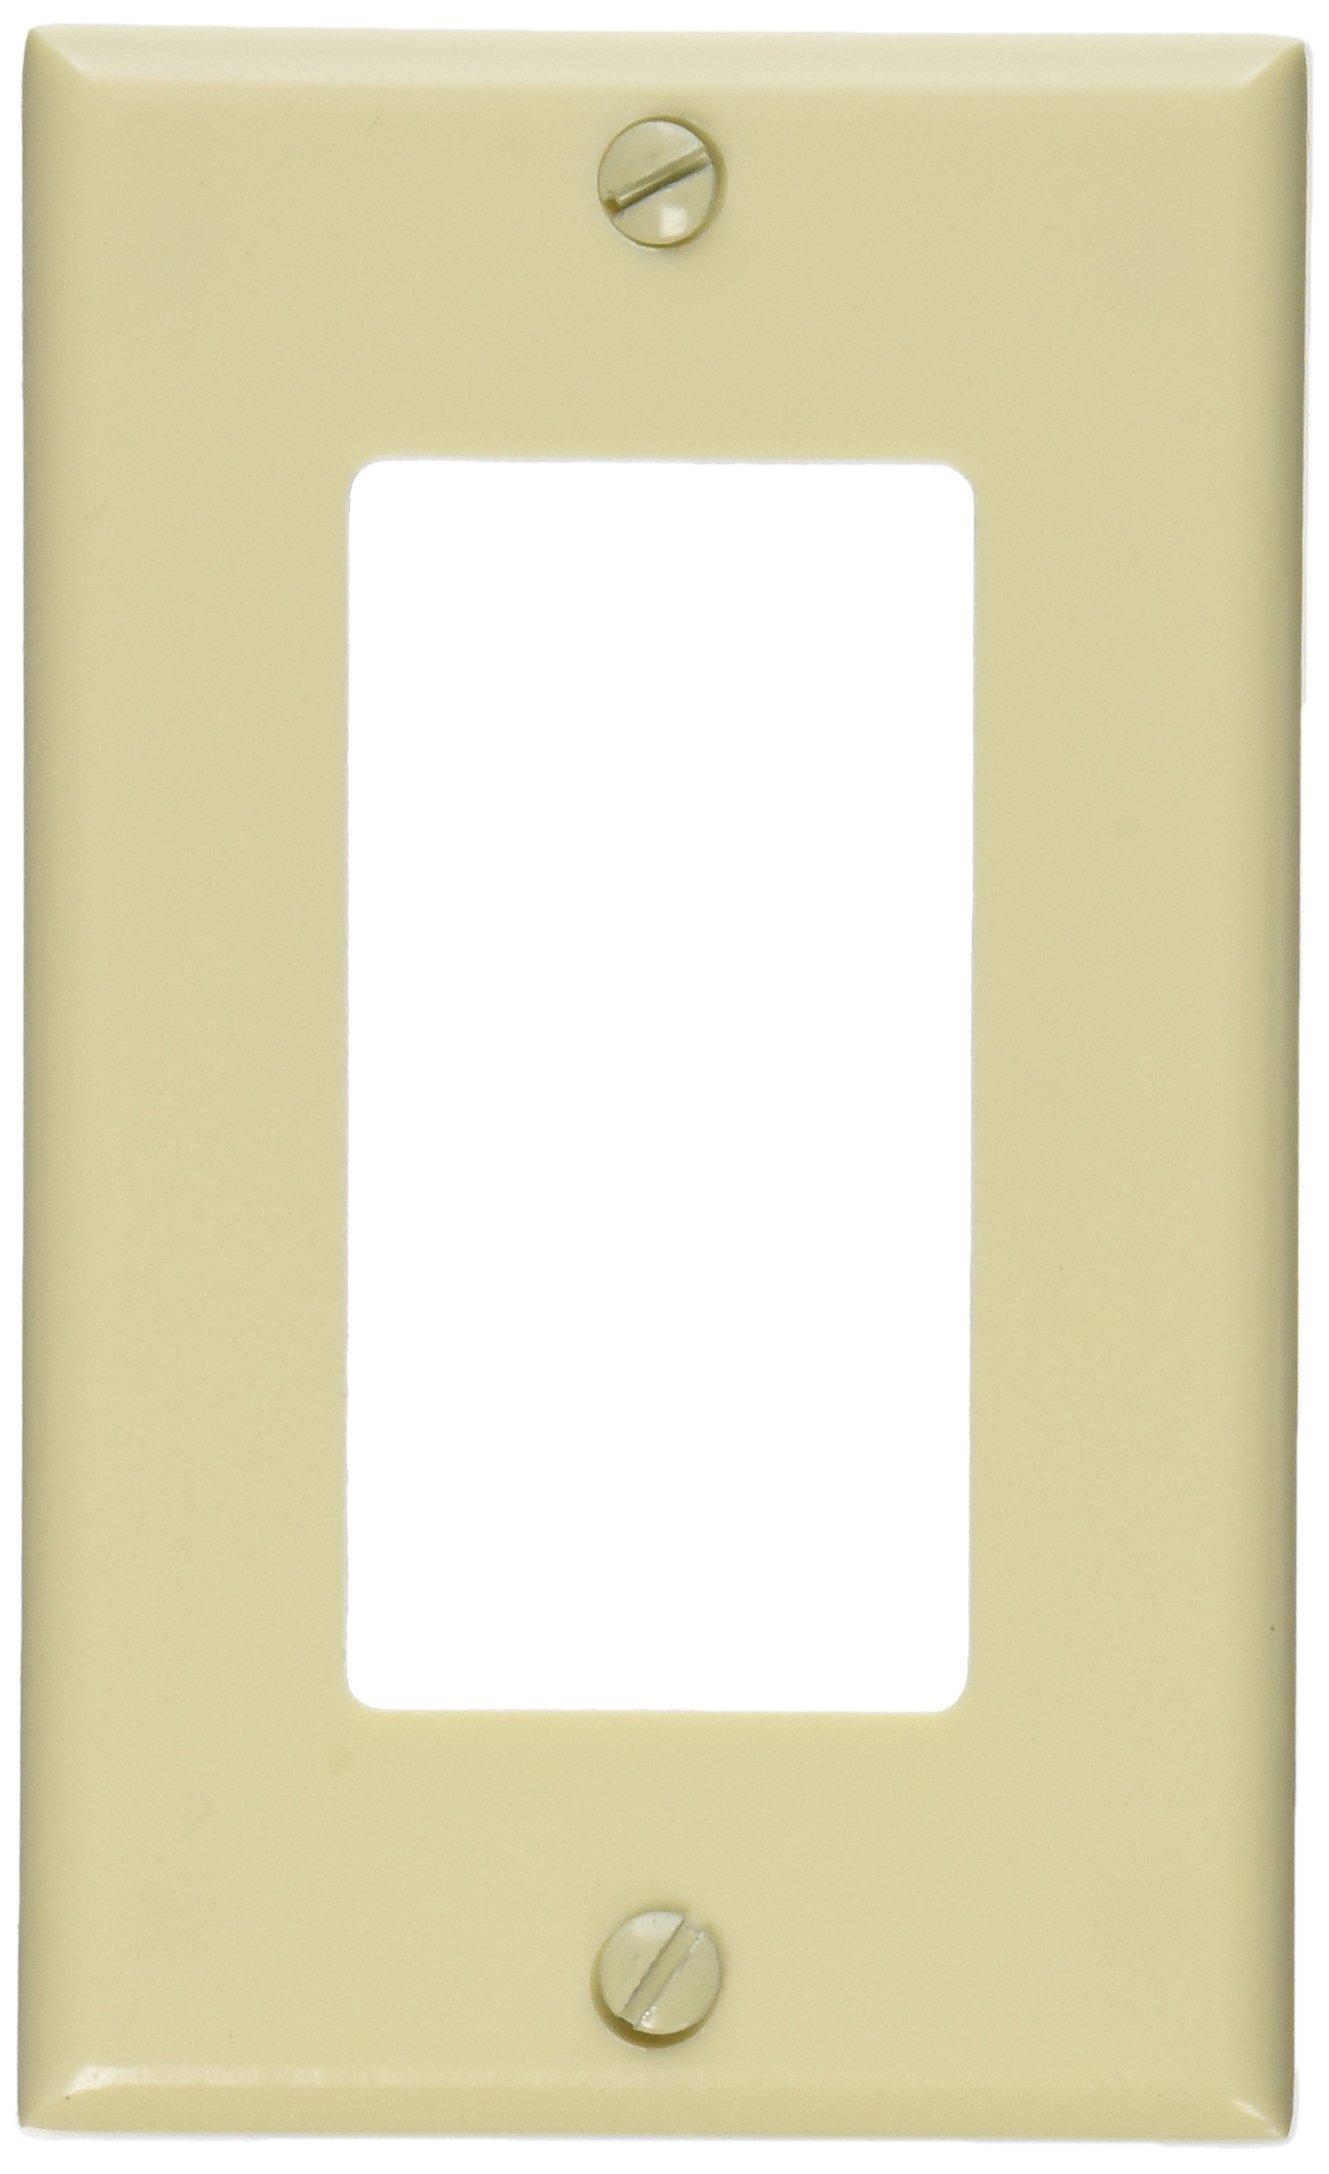 Leviton 80401-I 1-Gang Decora/GFCI Device Wallplate, Standard Size, Thermoset, Device Mount, Ivory